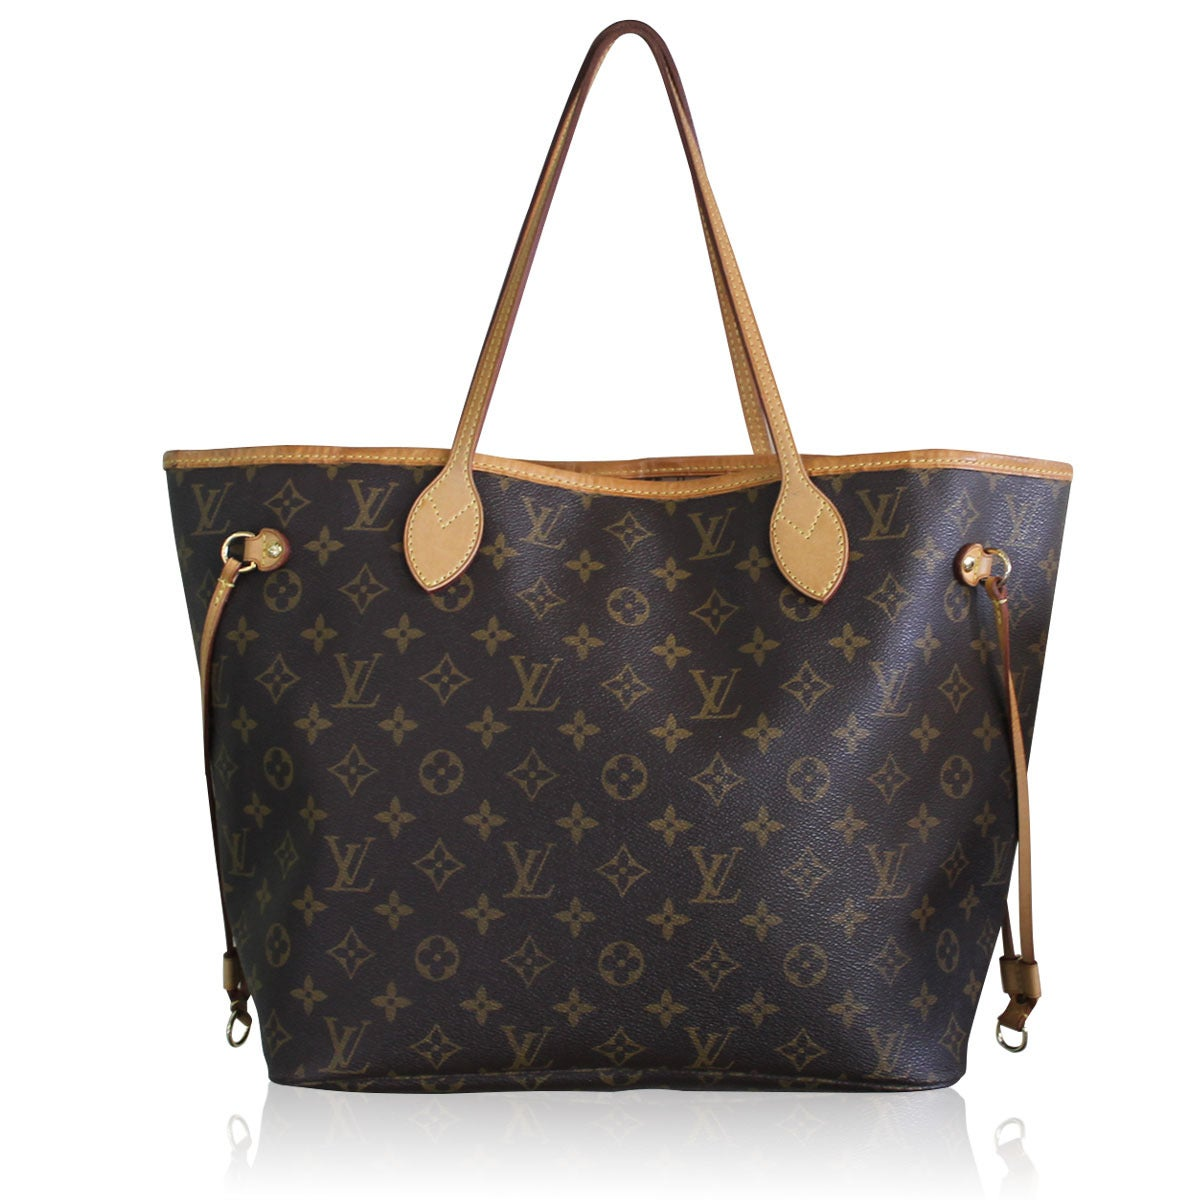 louis vuitton neverfull mm monogram. Louis Vuitton Neverfull MM Monogram Canvas Handbag Tote 3 Mm A